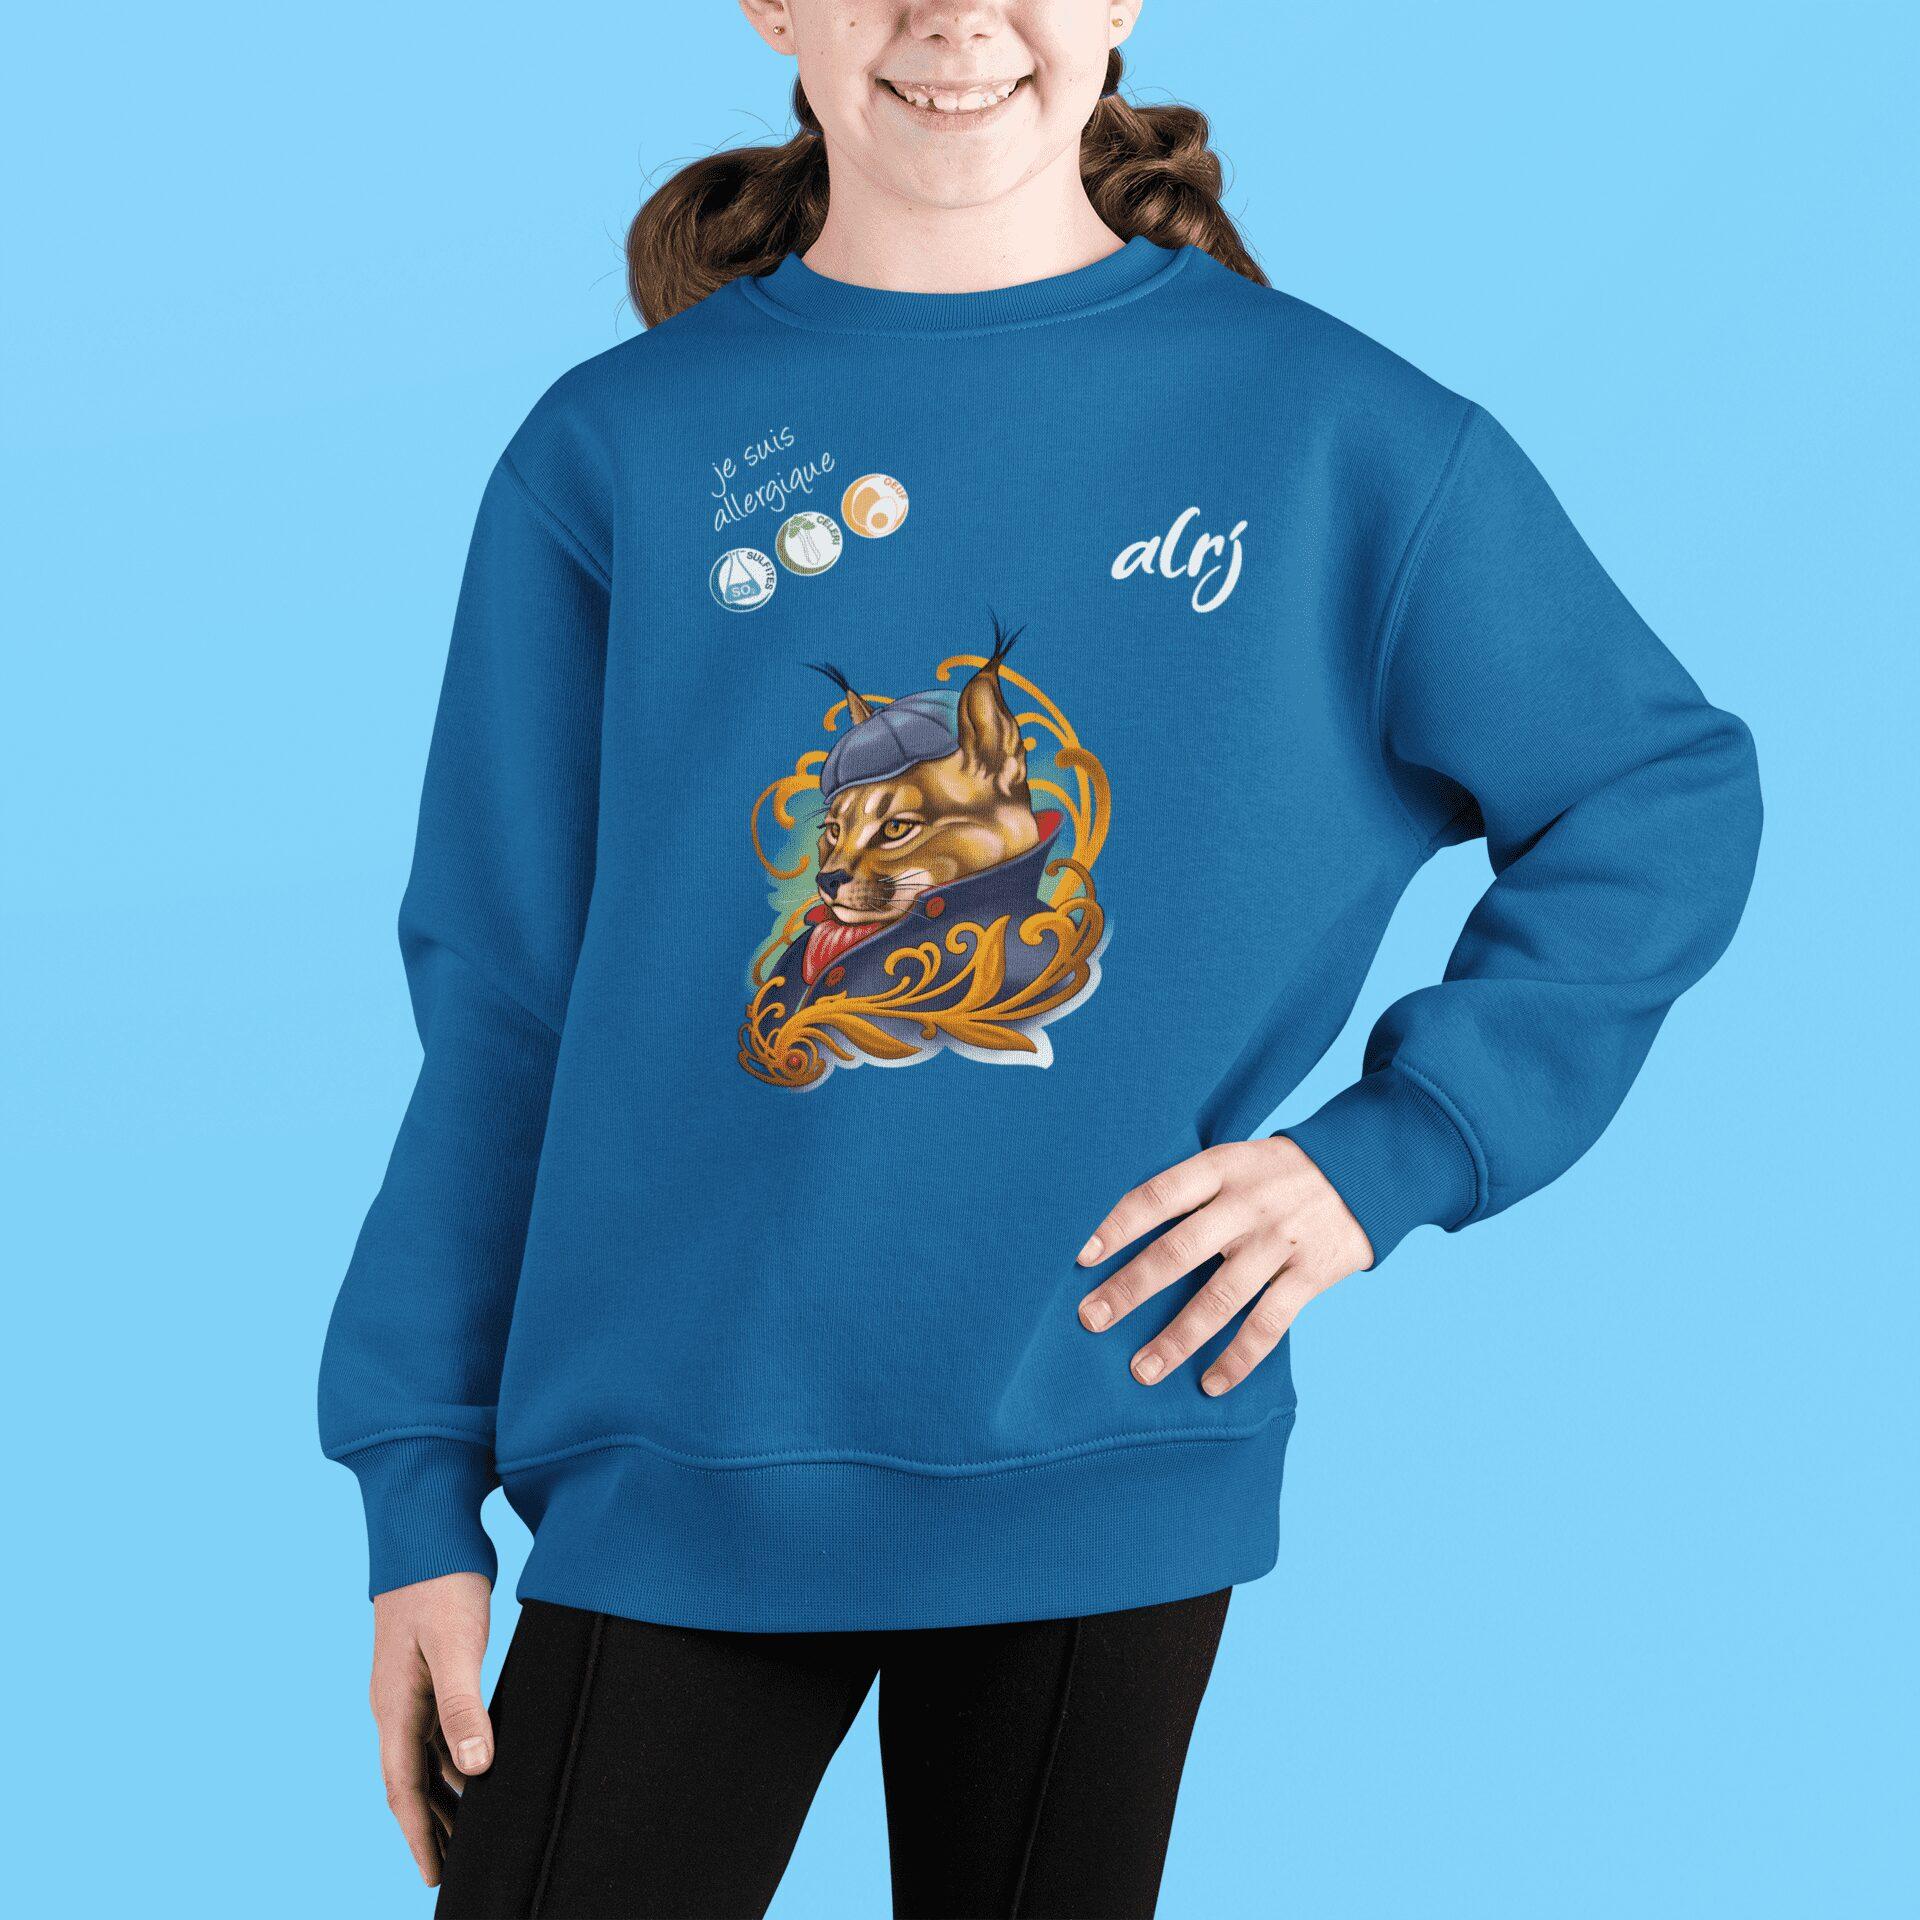 fille portant un pull alrj allergies alimentaires motif lynx